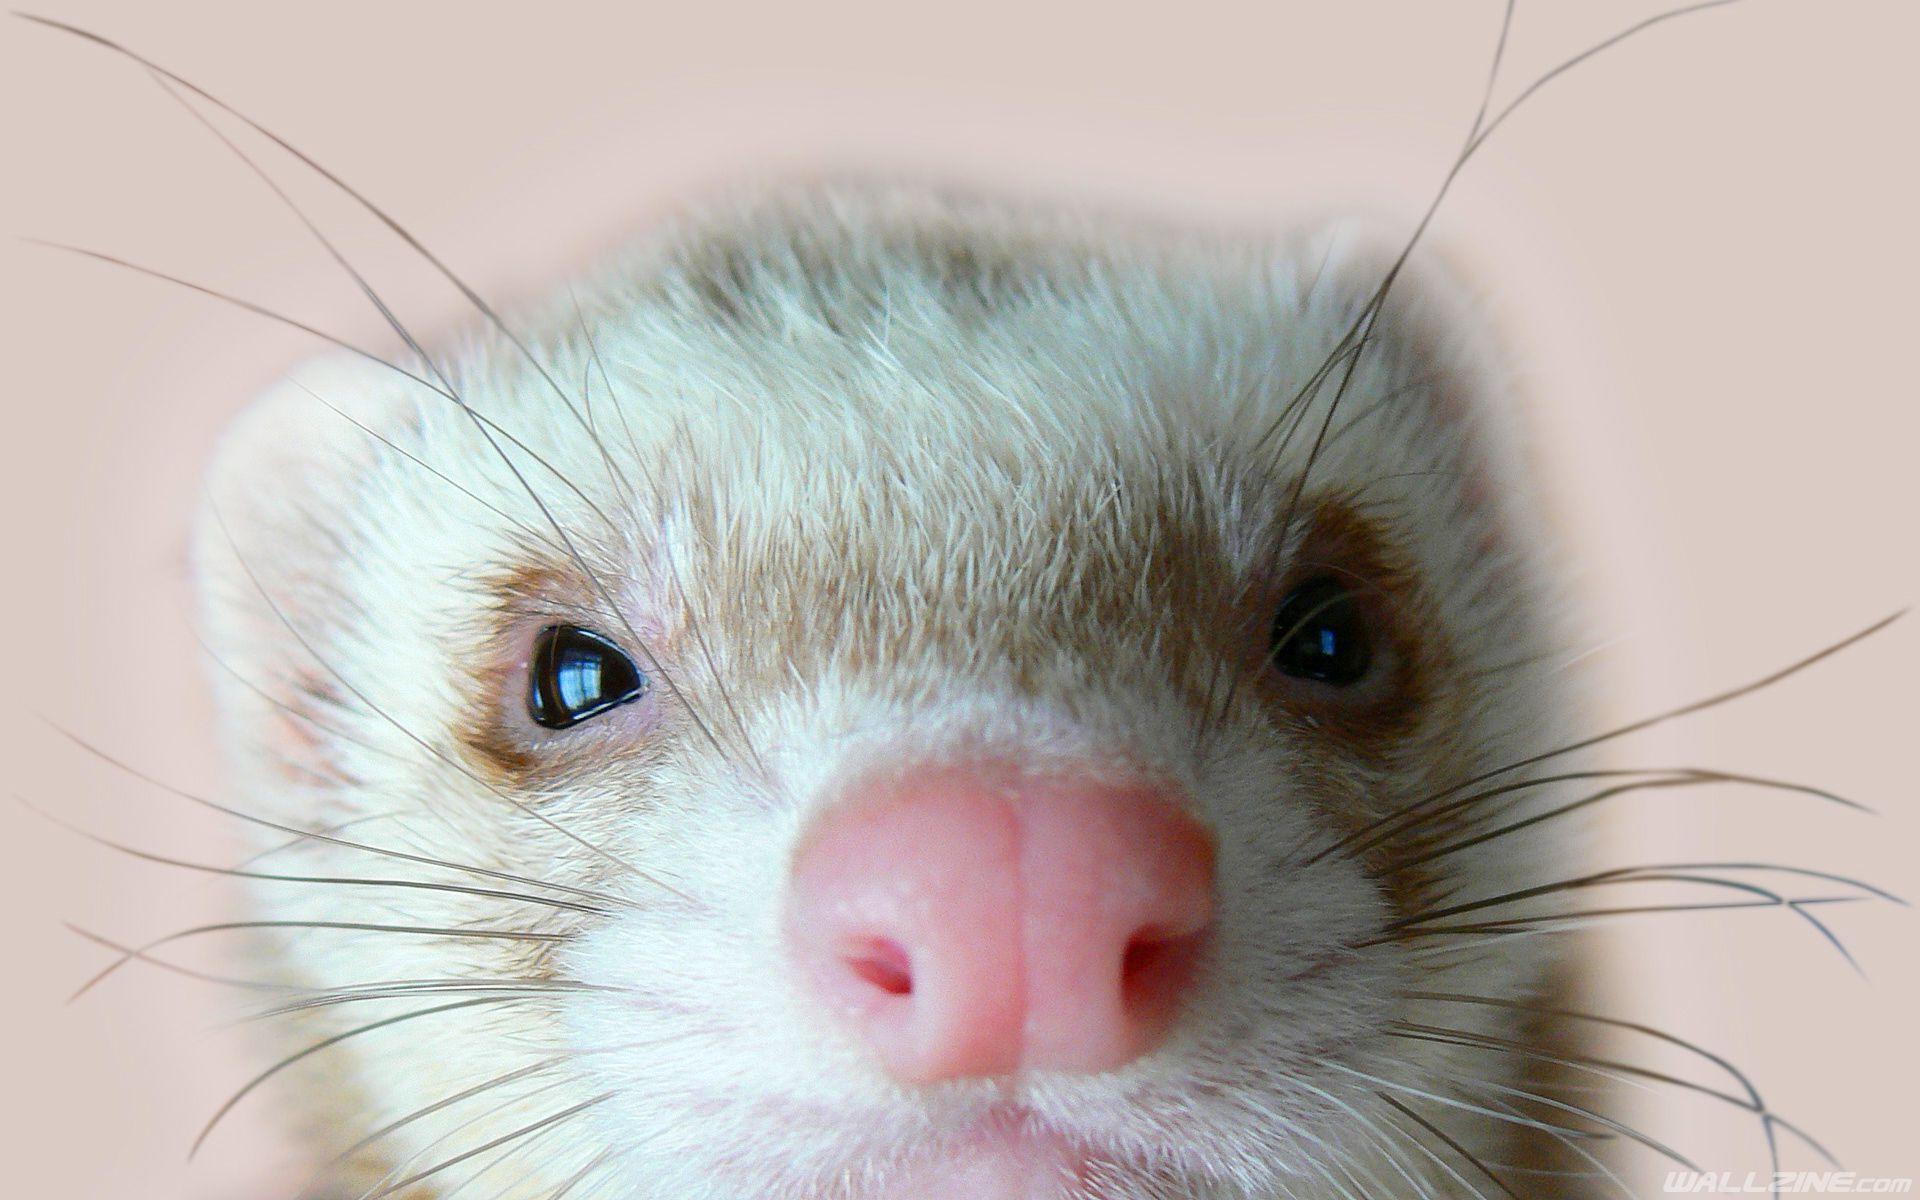 Cute Ferret Hd Desktop Wallpaper Wallzine Com Cute Ferrets Ferret Pet Ferret